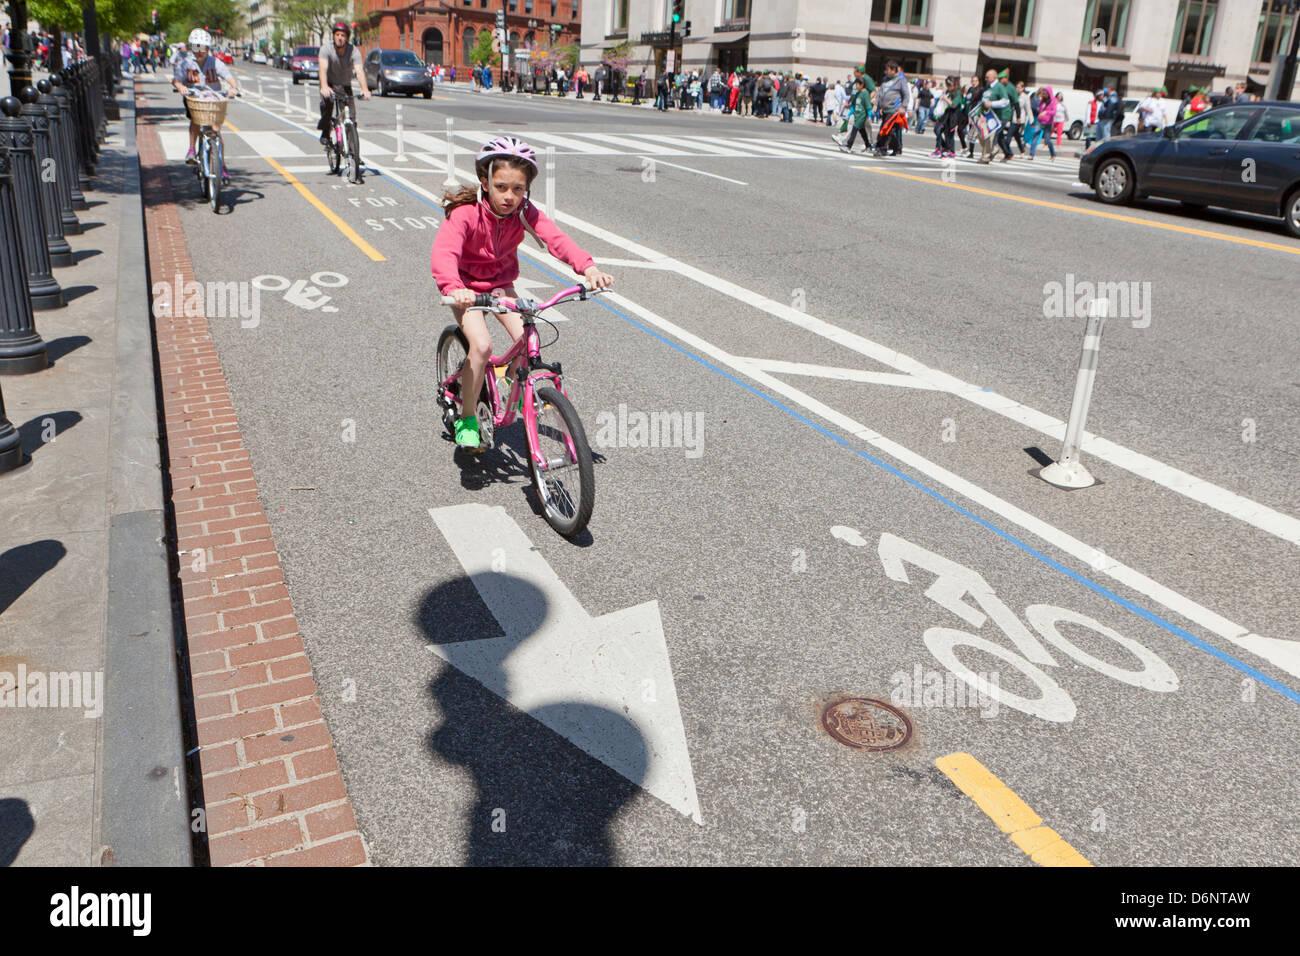 Small girl riding a bike in designated bicycle lane - Washington, DC USA - Stock Image